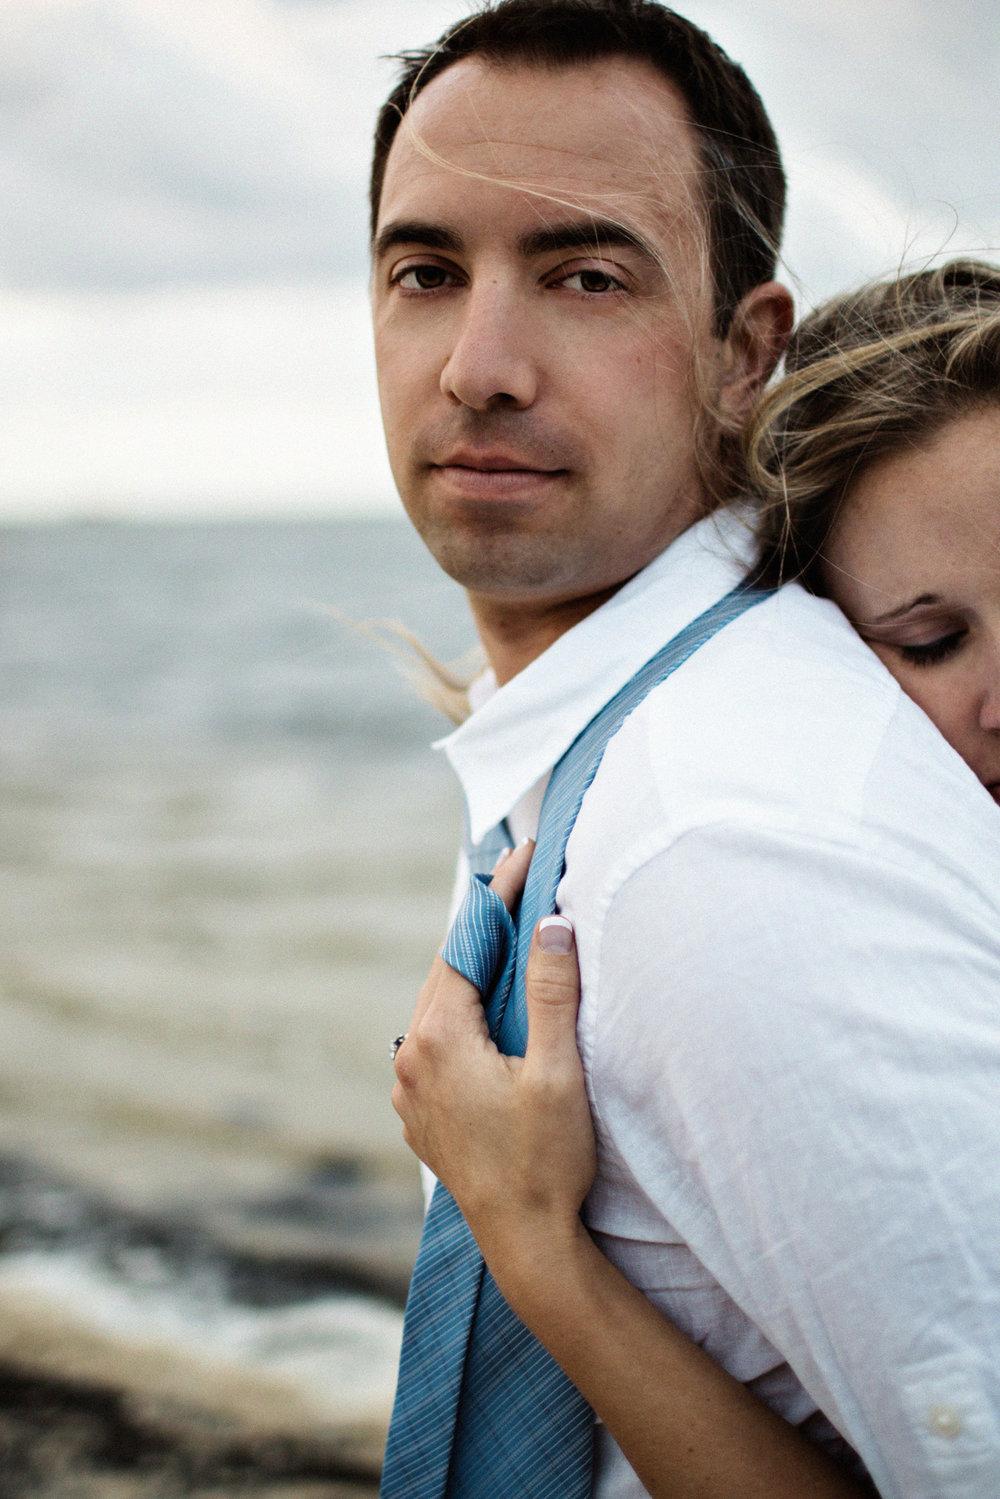 Jonathan&BrittanyEngagementSOCIALMEDIA-10.jpg